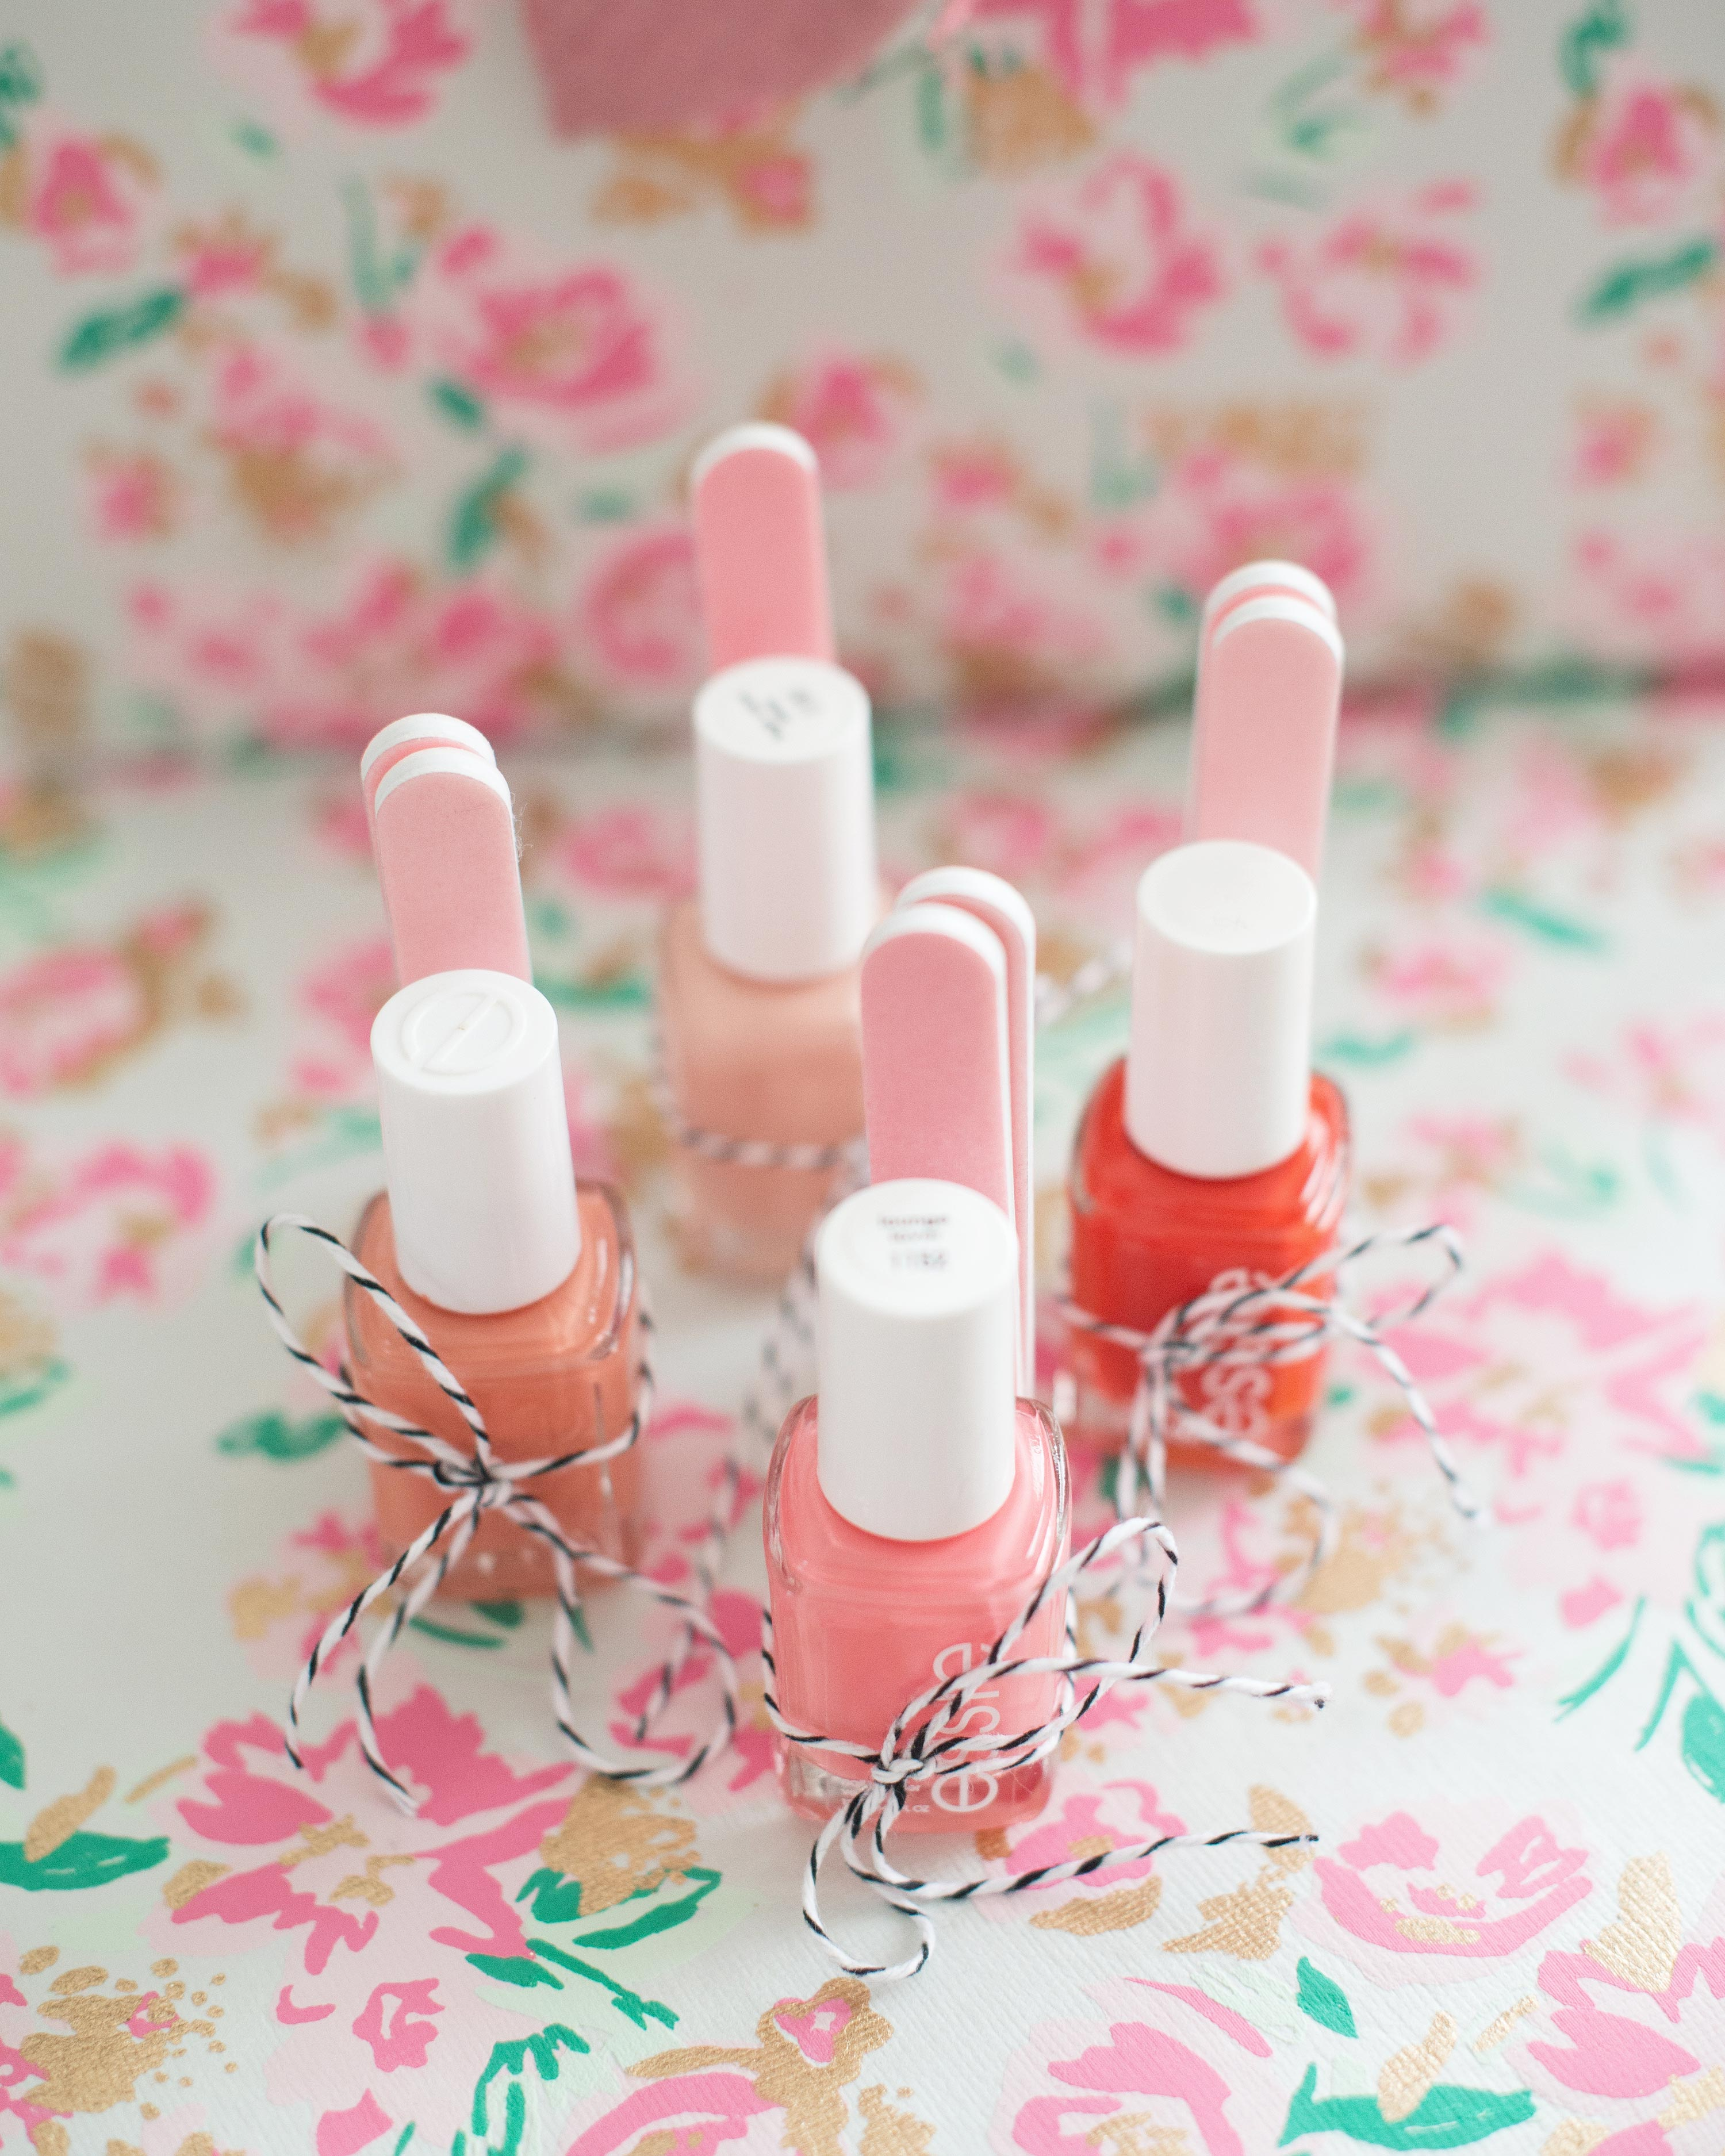 adrienne-bridal-shower-nailpolish-16-6134175-0716.jpg